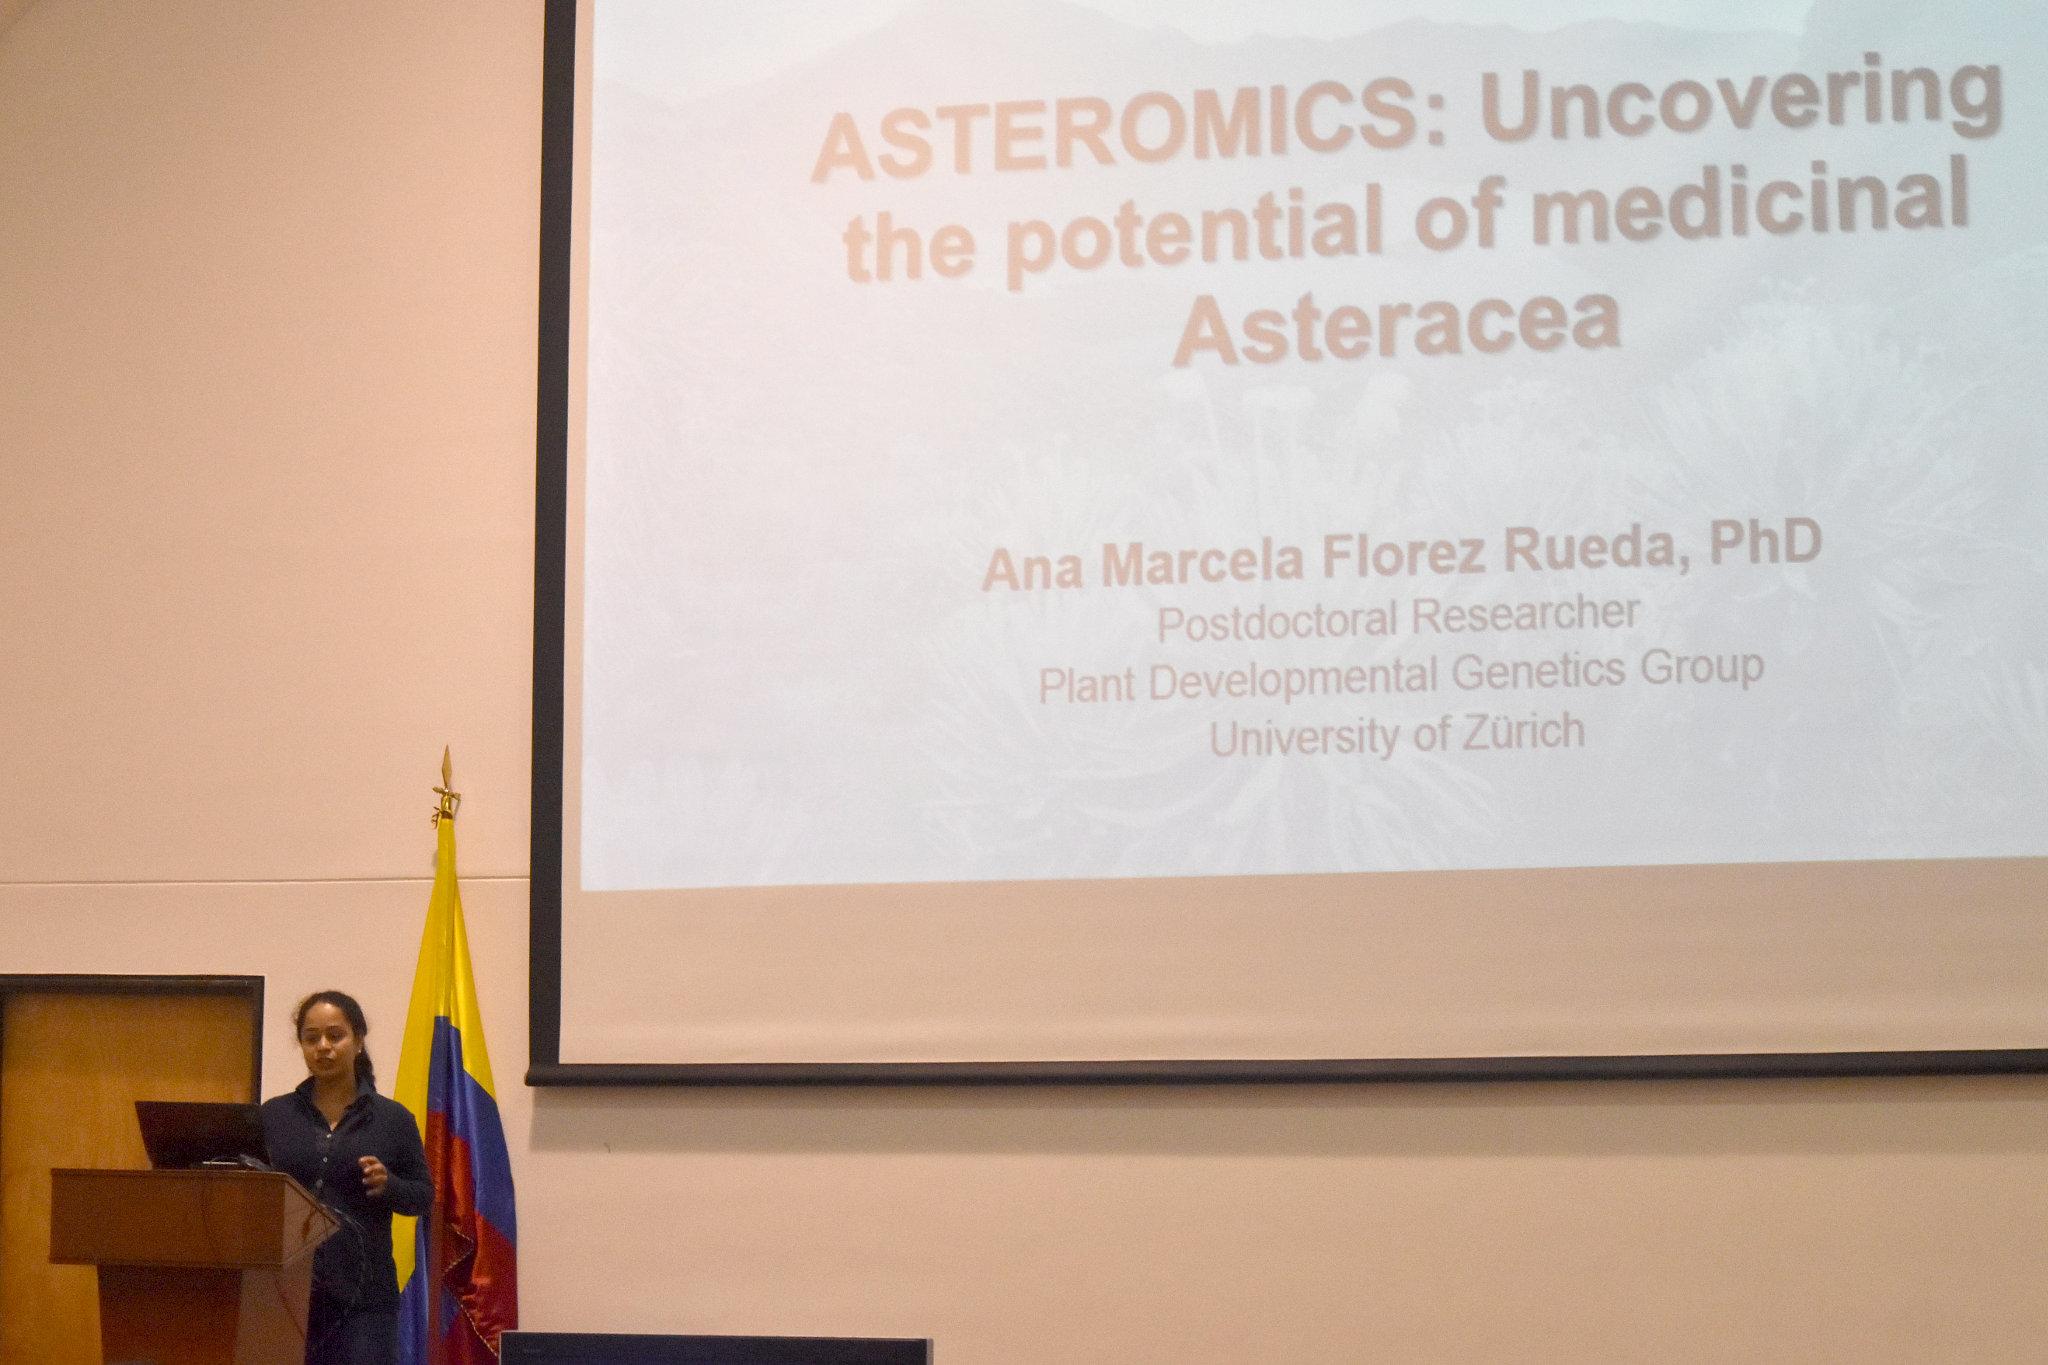 Ana Marcela Flórez Rueda (Foto: Laura Berrío)